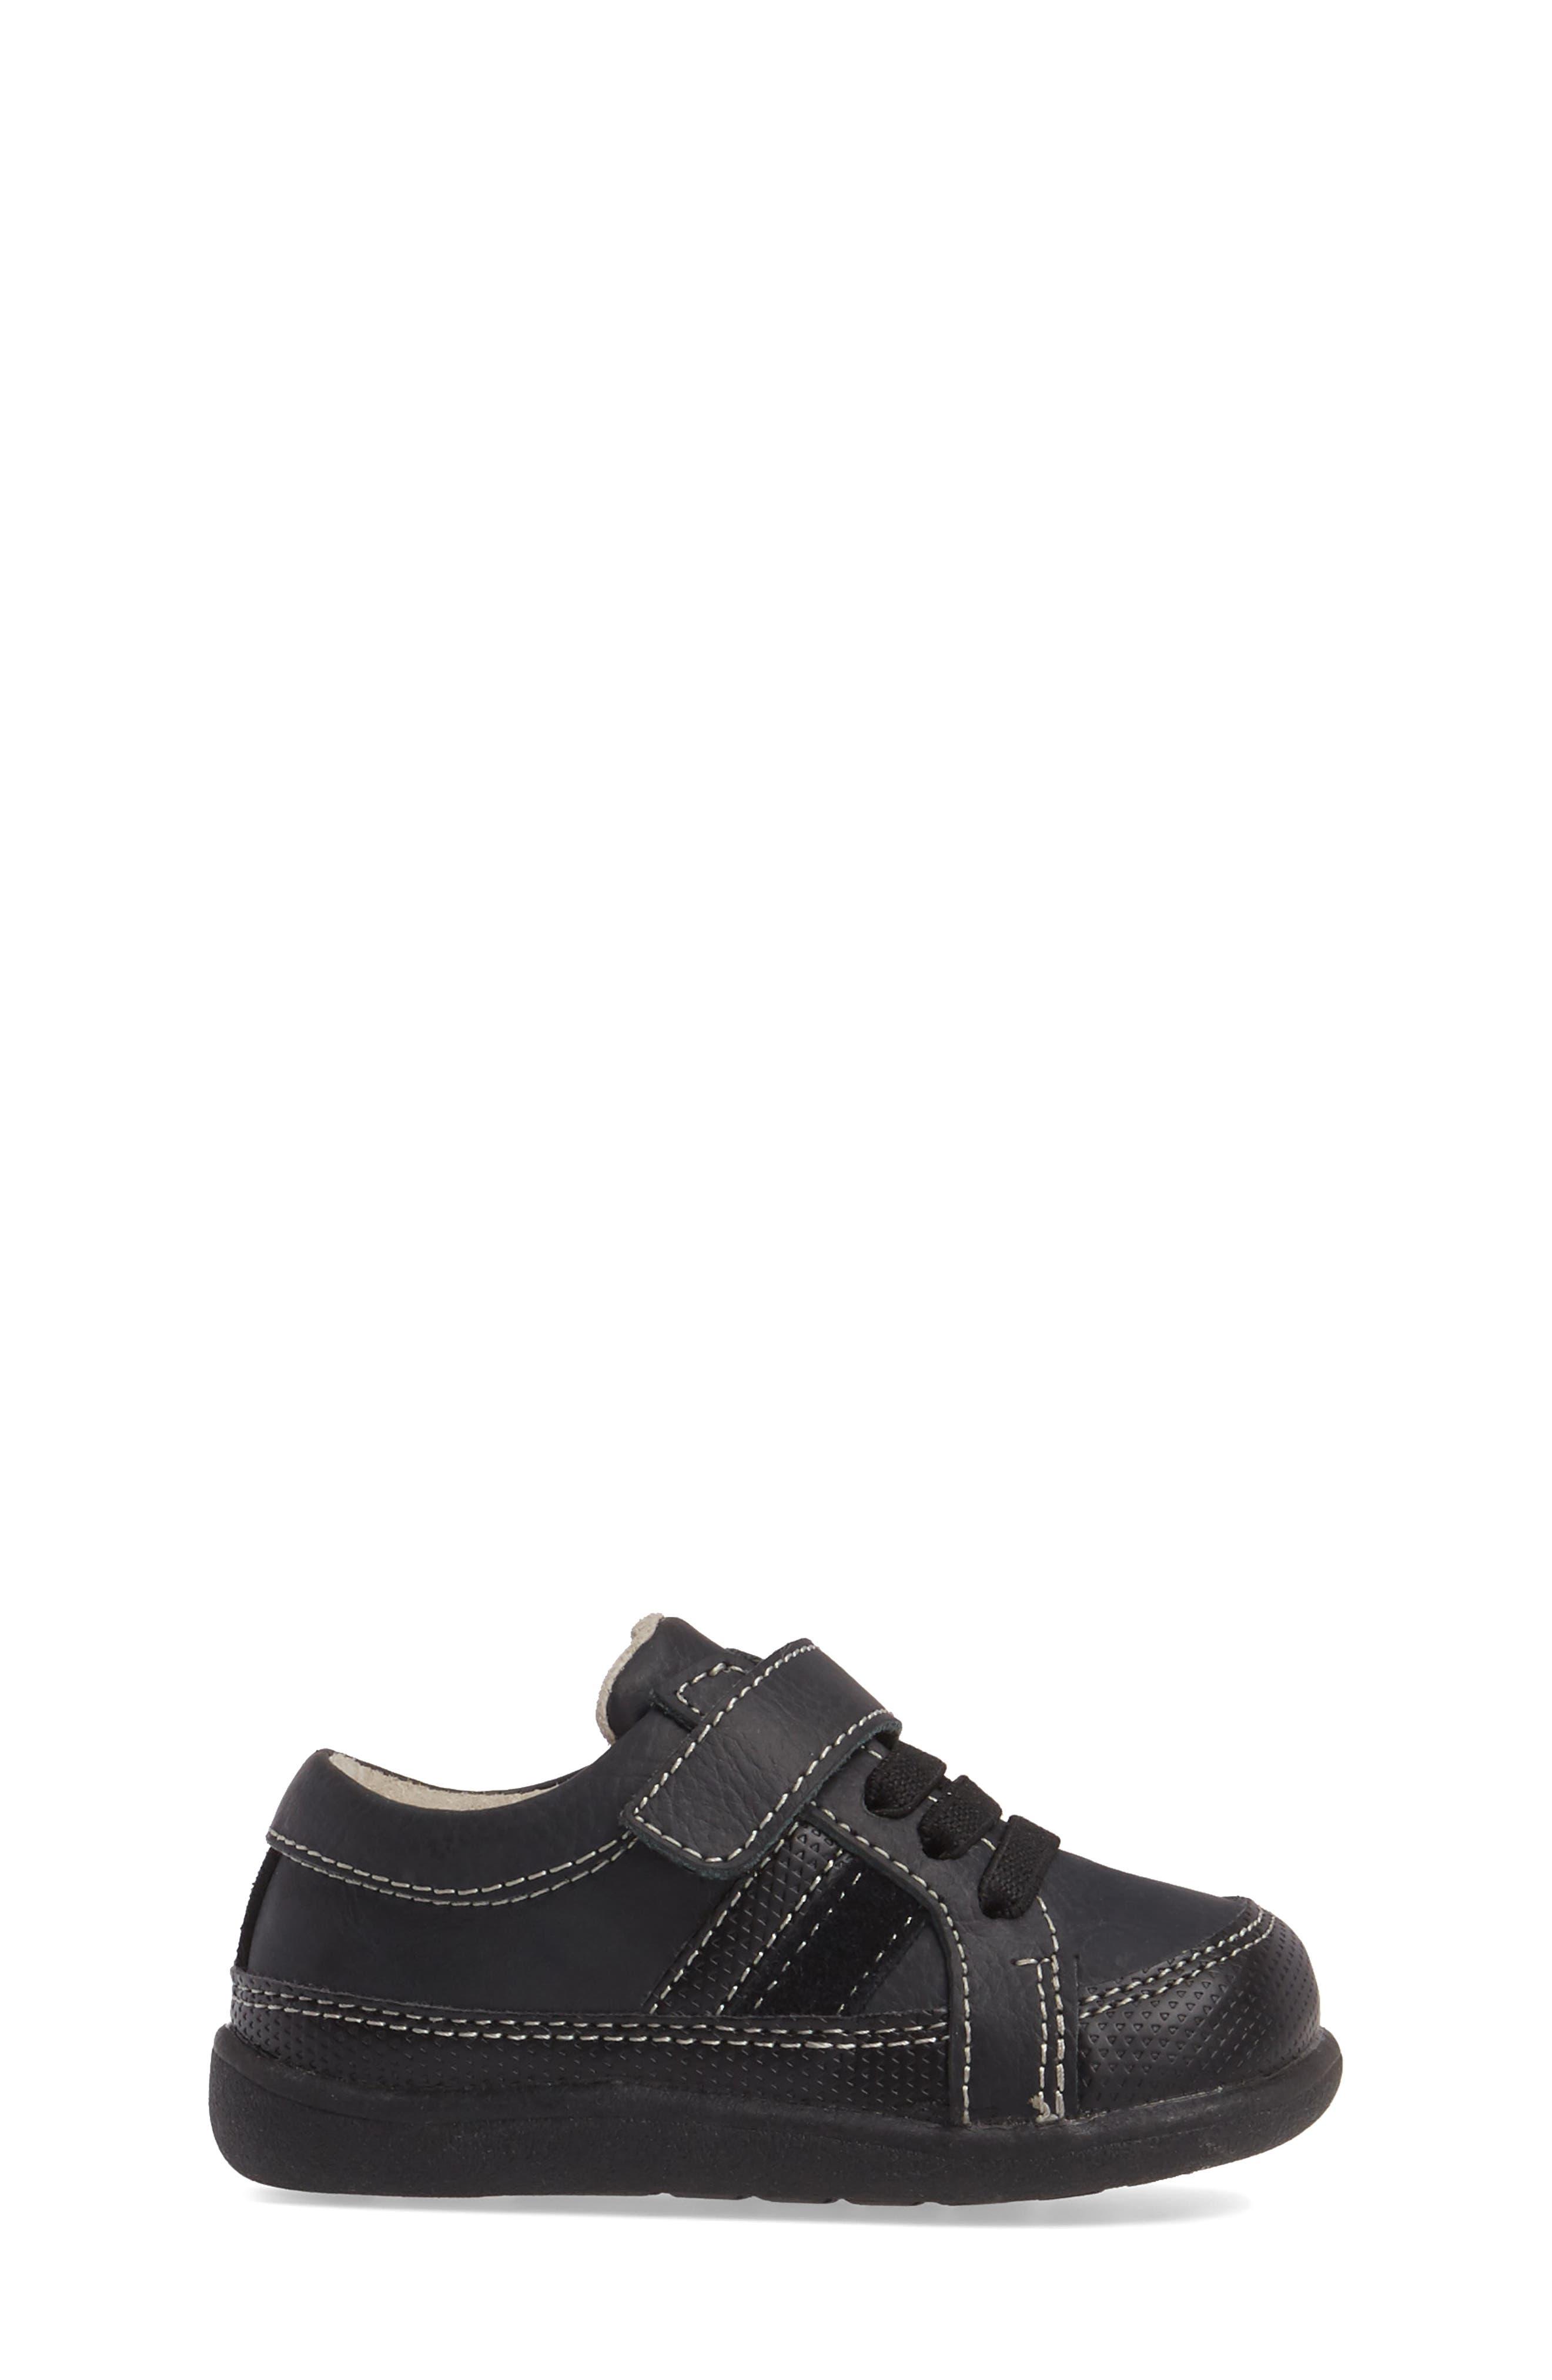 Randall II Sneaker,                             Alternate thumbnail 3, color,                             Black